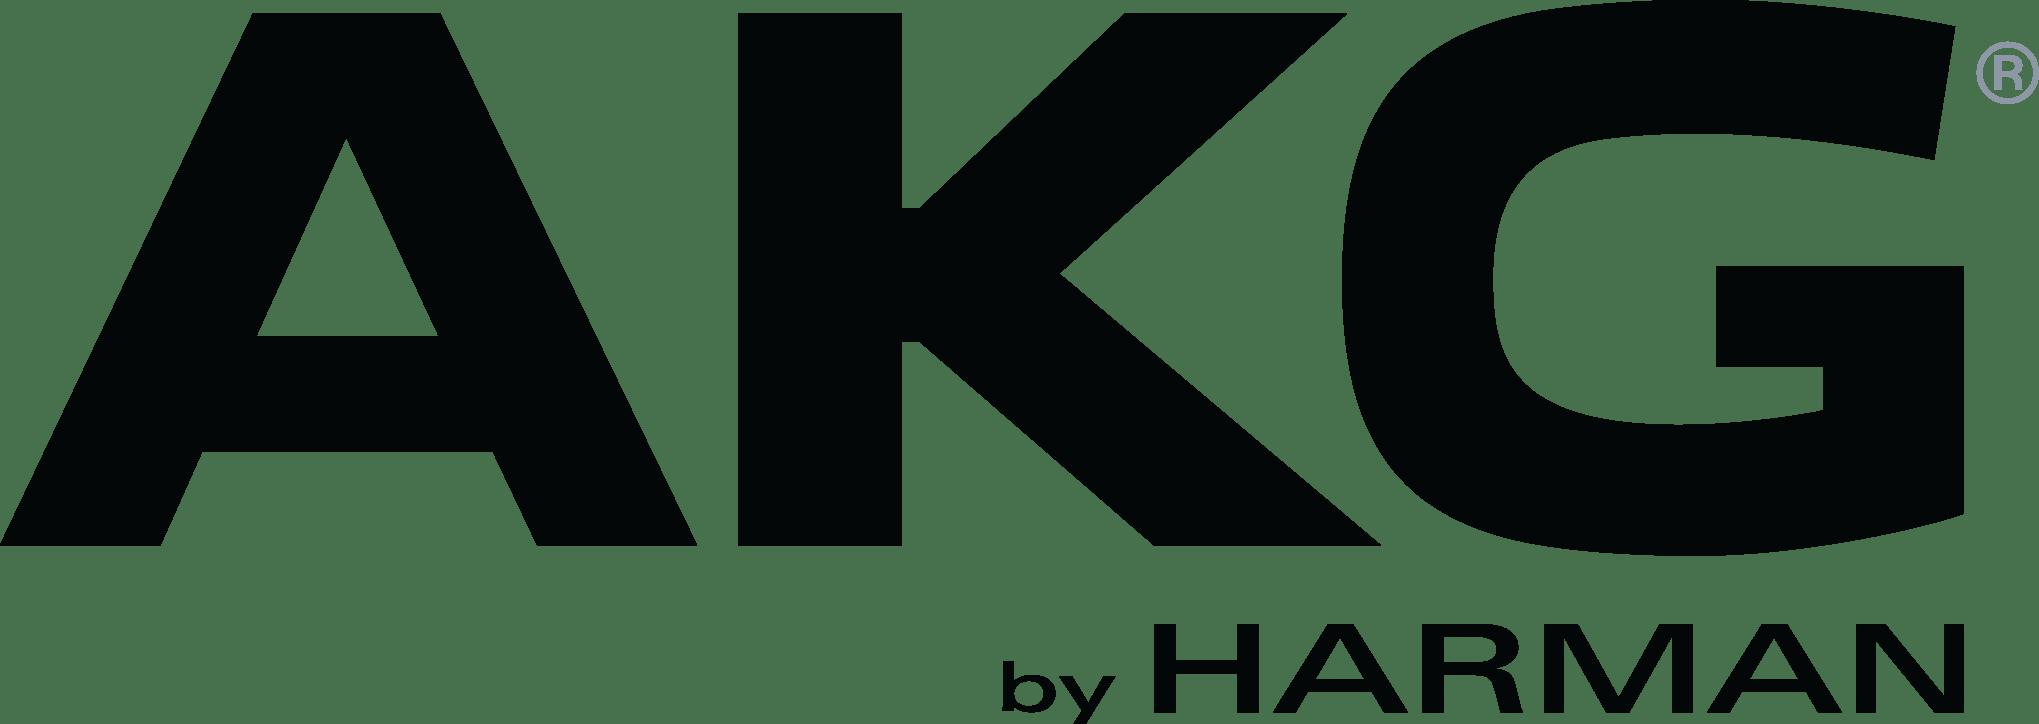 logo-AKG_byHARMAN_black